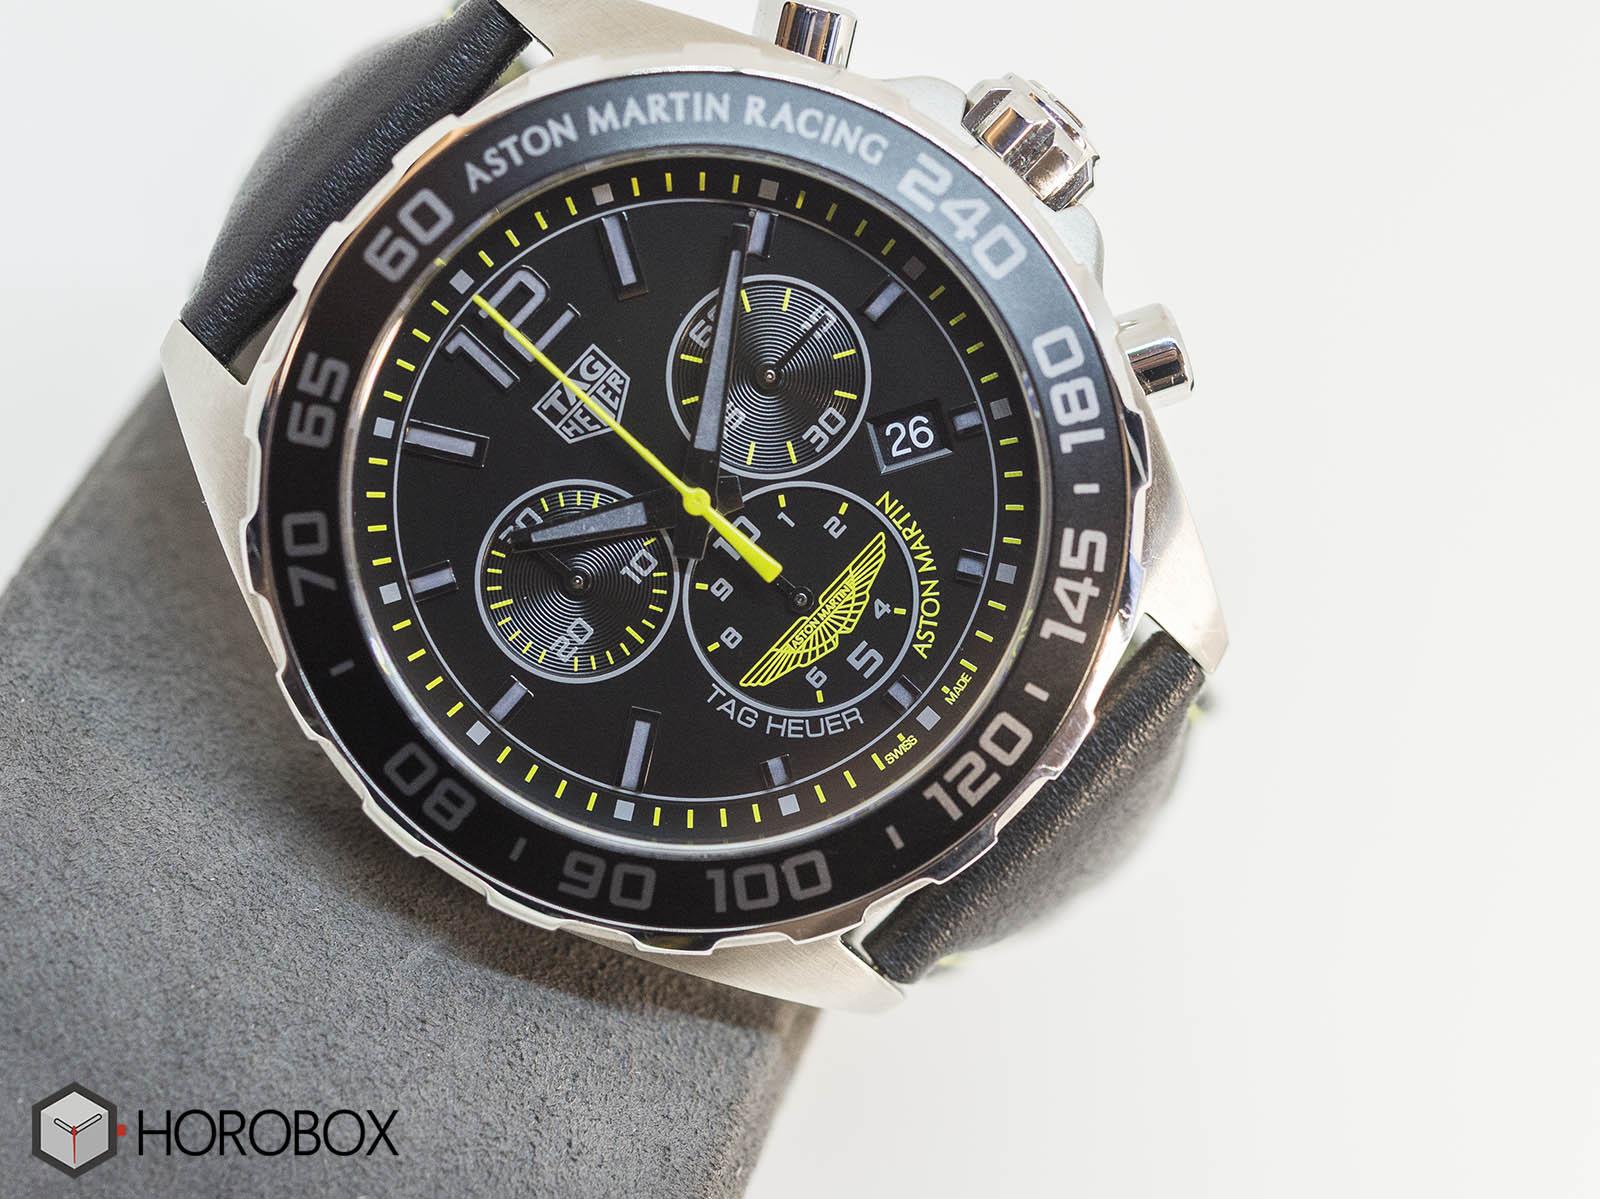 caz101p-fc8245-tag-heuer-formula-1-chronograph-4.jpg